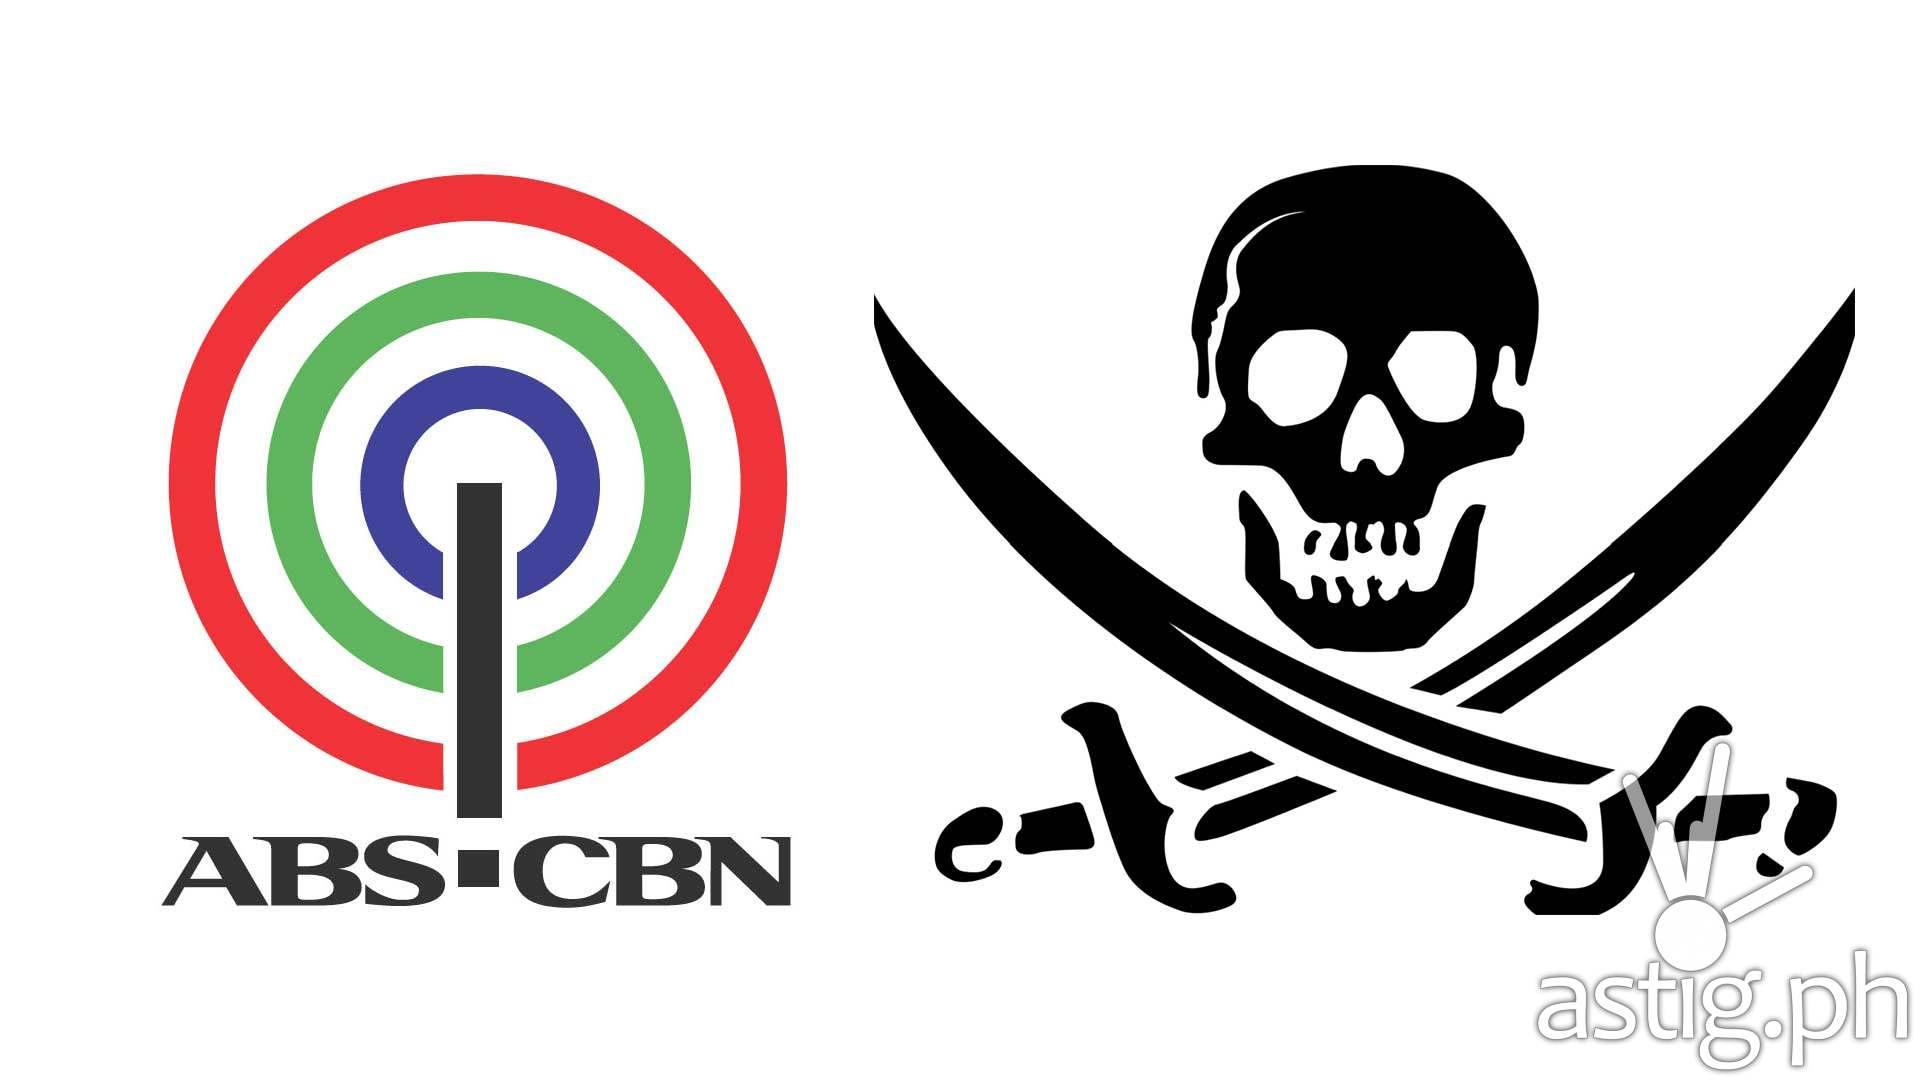 ABS-CBN vs piracy